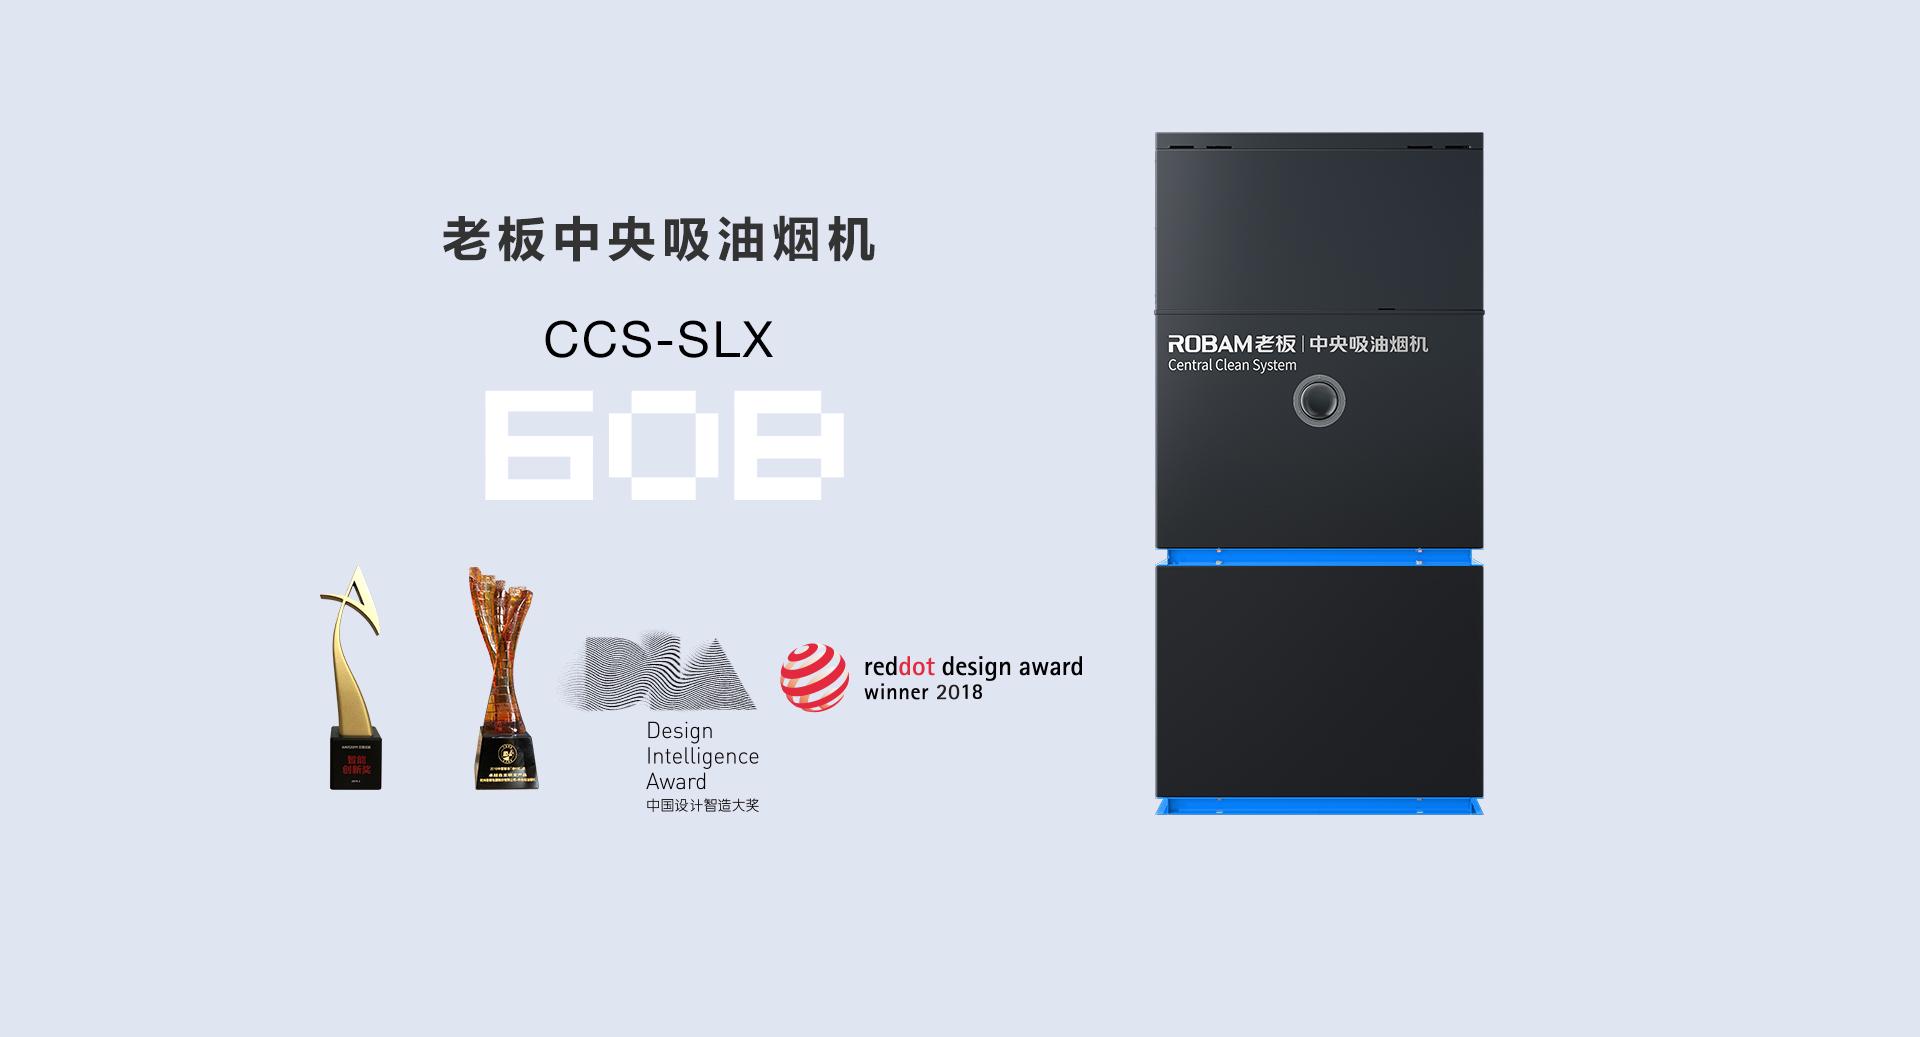 CCS-SLX-60B-详情页-PC端-201225_01.png